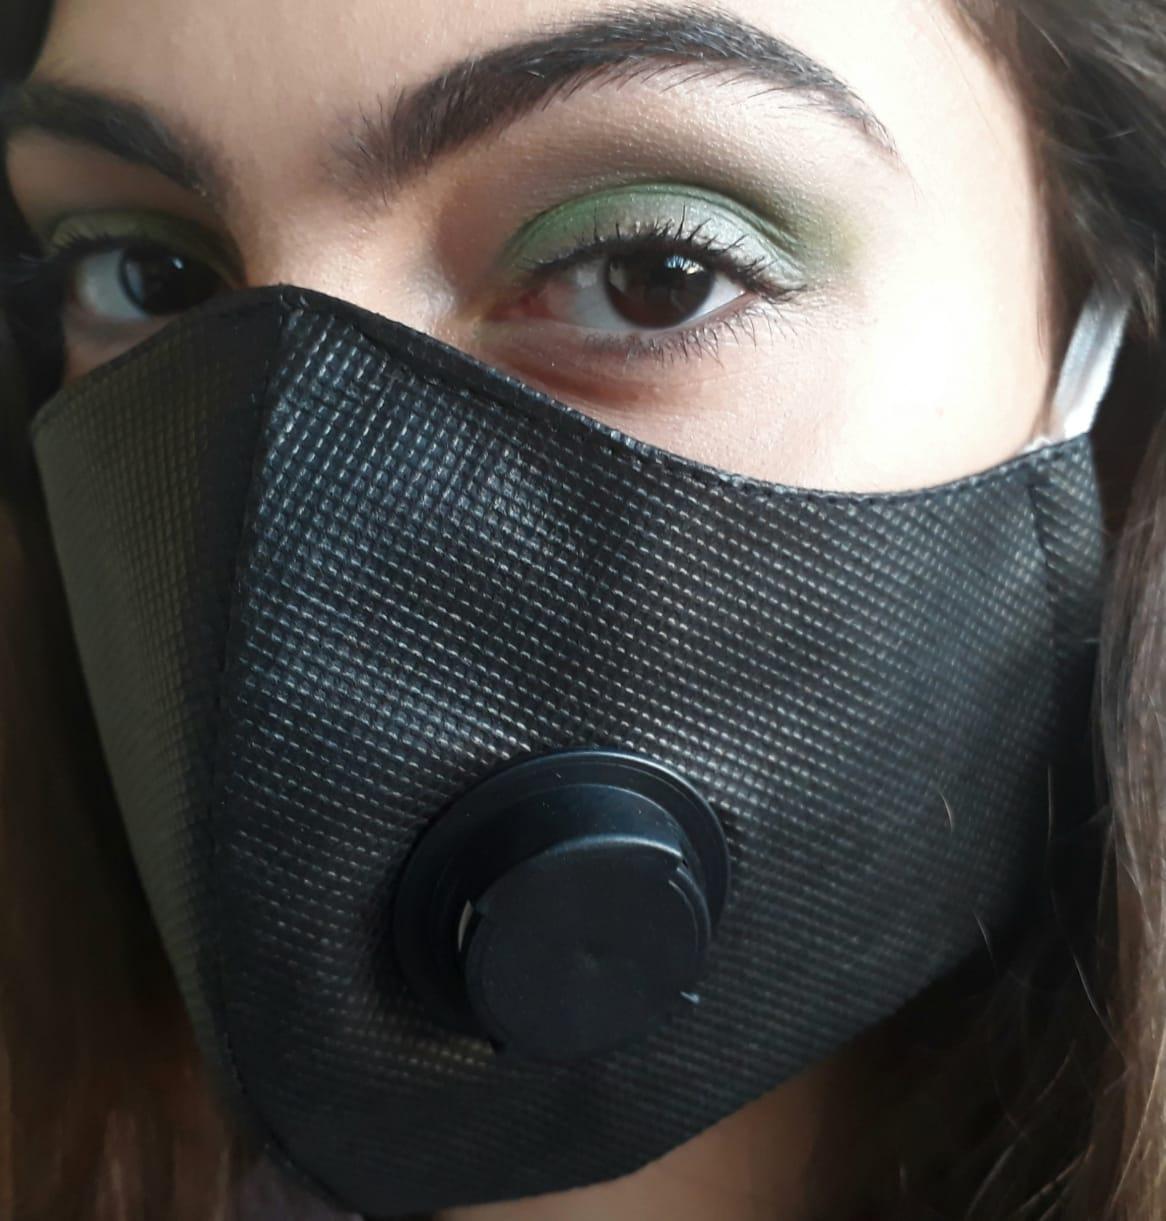 Kit 10 Máscaras Proteção TNT DUPLO COM RESPIRADOR PRETO + CLIP NASAL